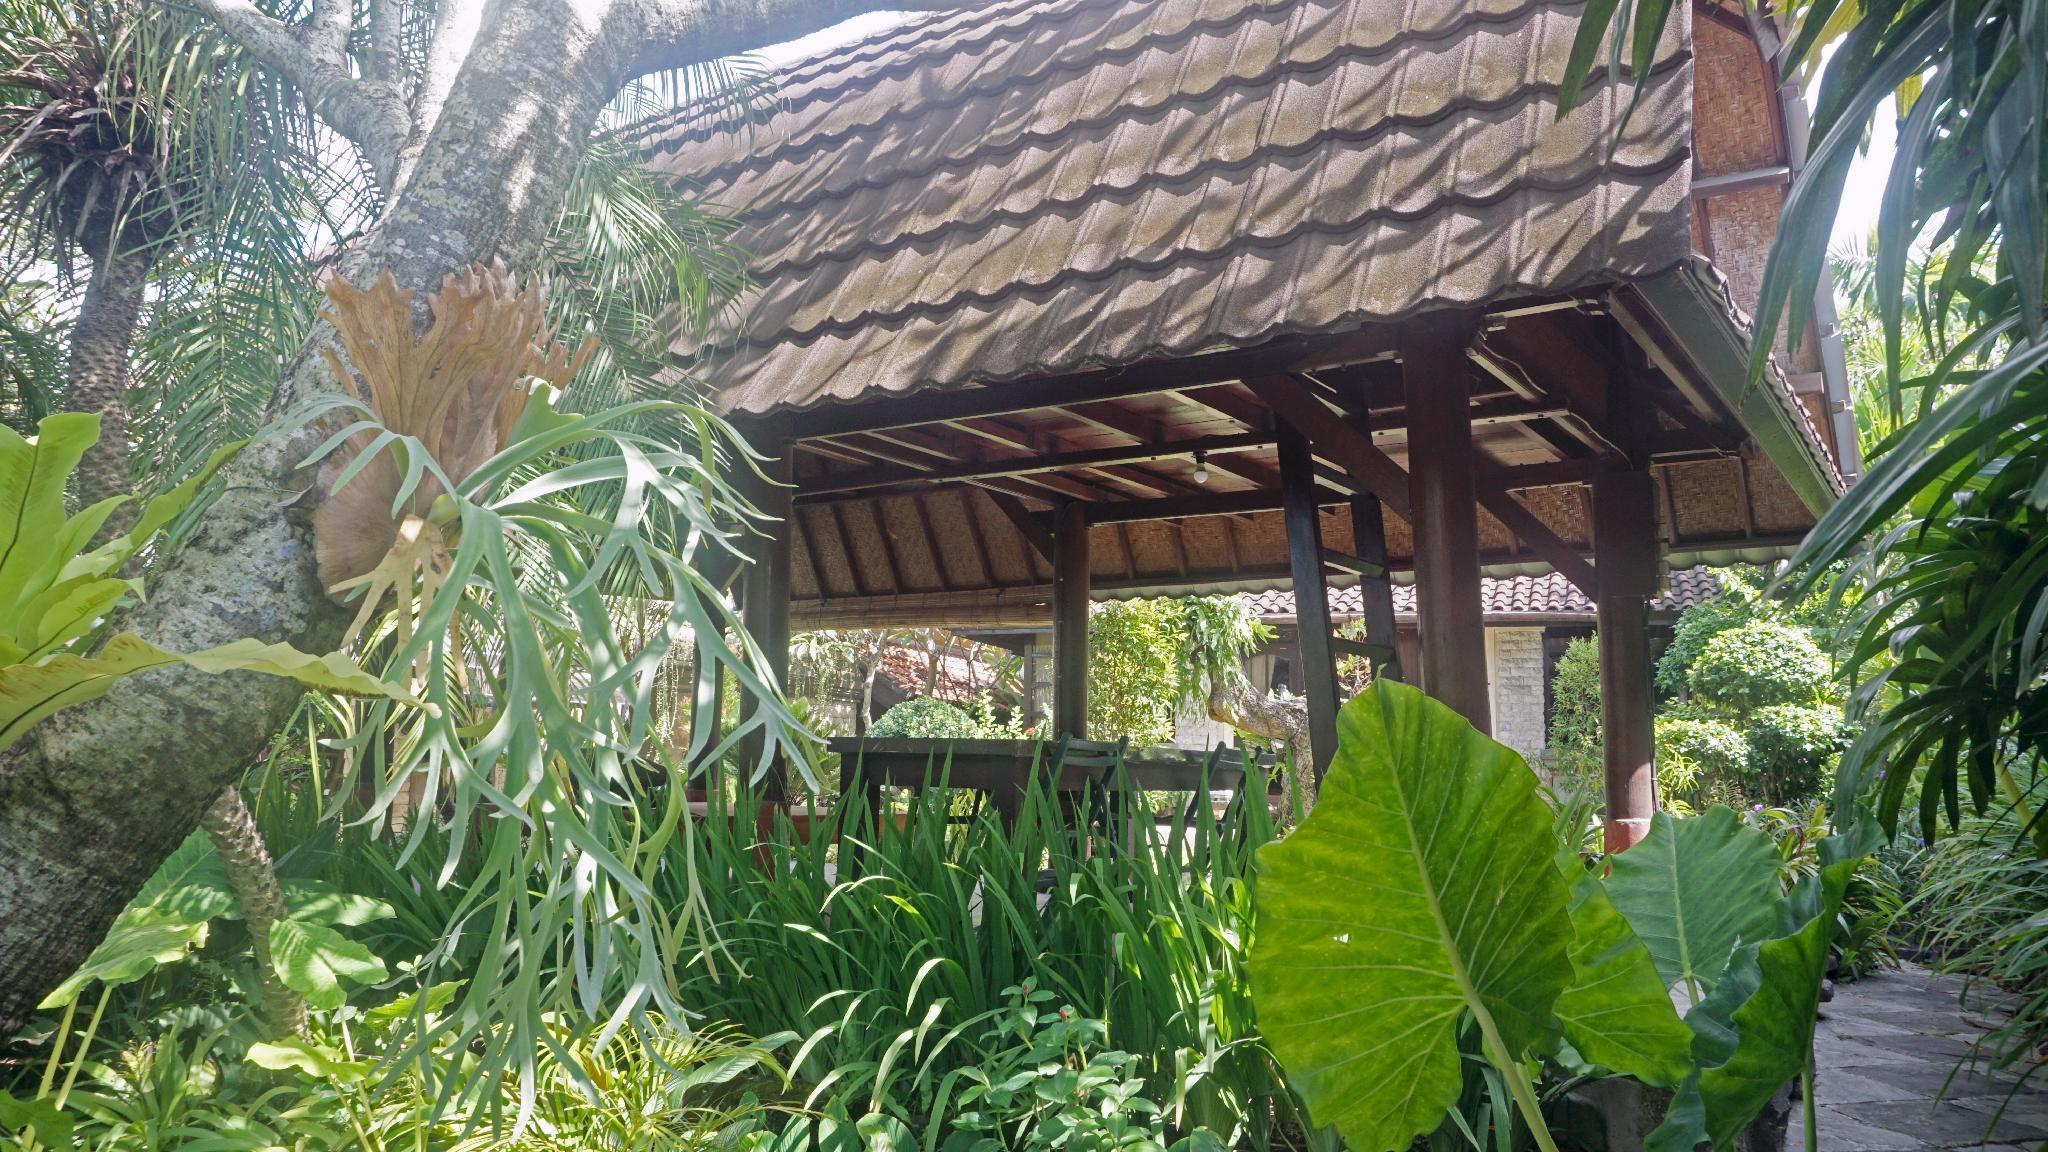 Umah Tuyang - Bali's postmodern style house